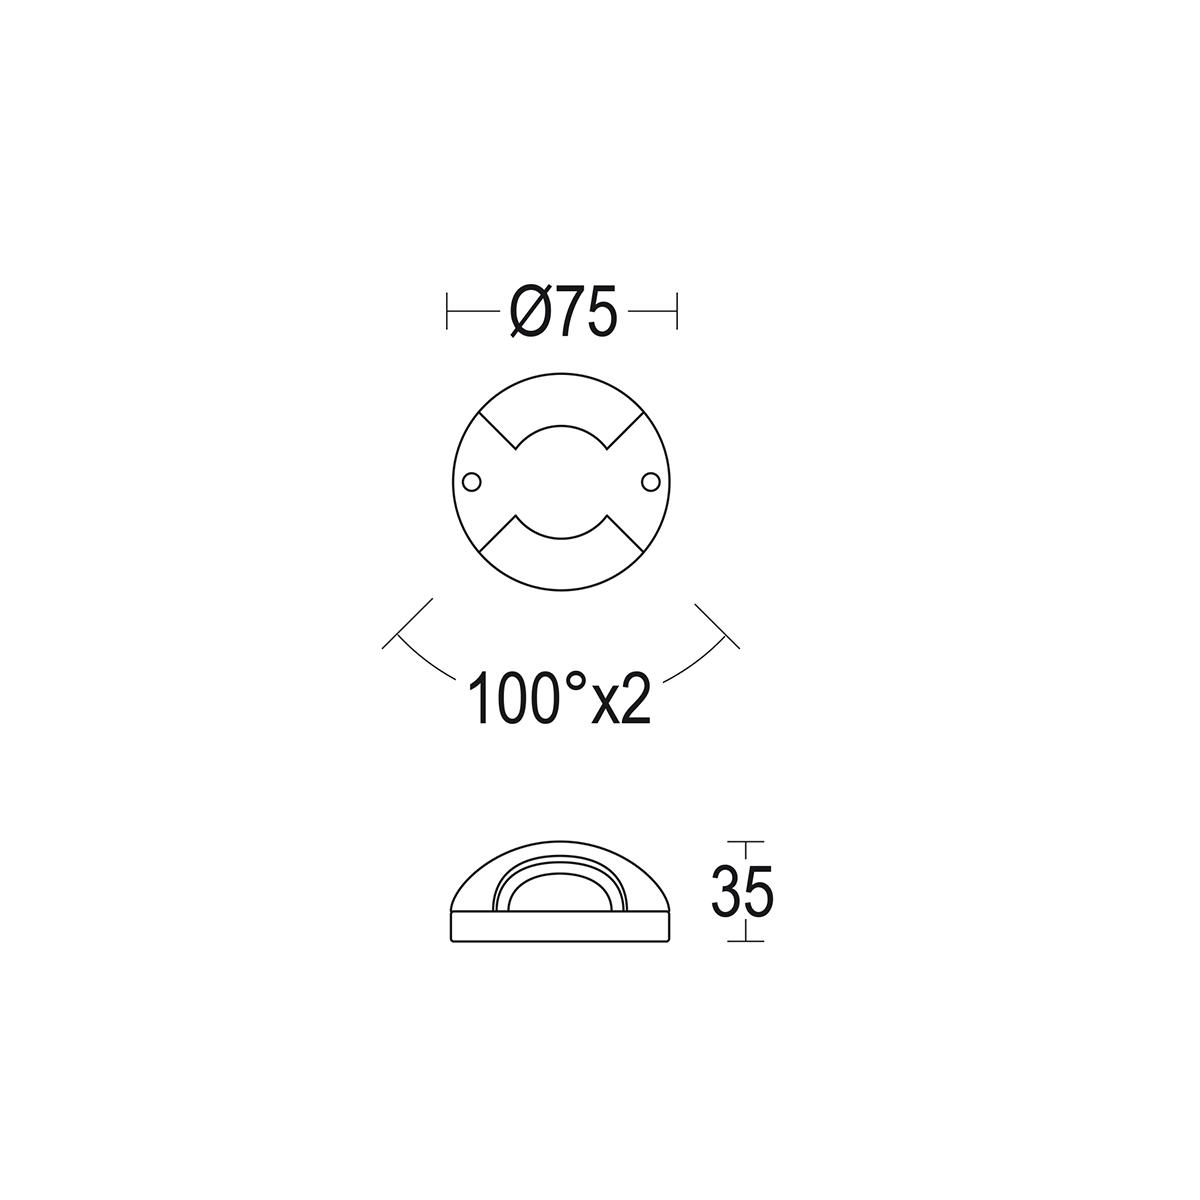 чертеж Microgeos 2L Flat 75 Ghidini уличный светильник GH1186.BAXT300EL